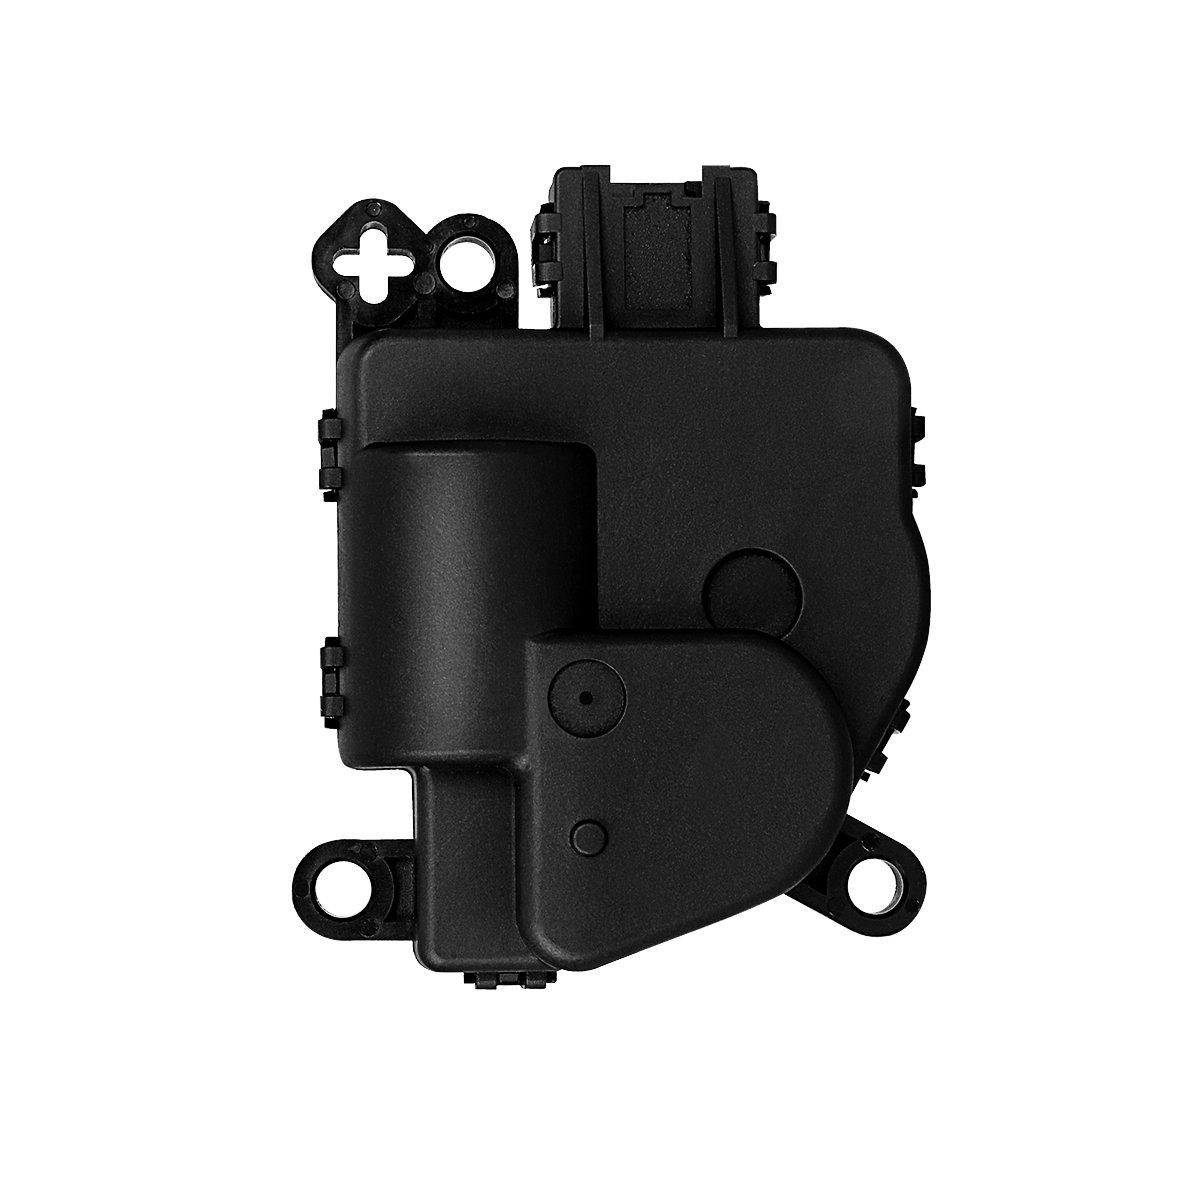 HVAC Air Door Actuator for 2011-2016 Ram 1500 | 2500 | 3500 | 4500 | 5500, 2009 2010 Dodge Ram 1500 | 2500 | 3500, Replaces# 604-005, 68089742AA PUENGSI